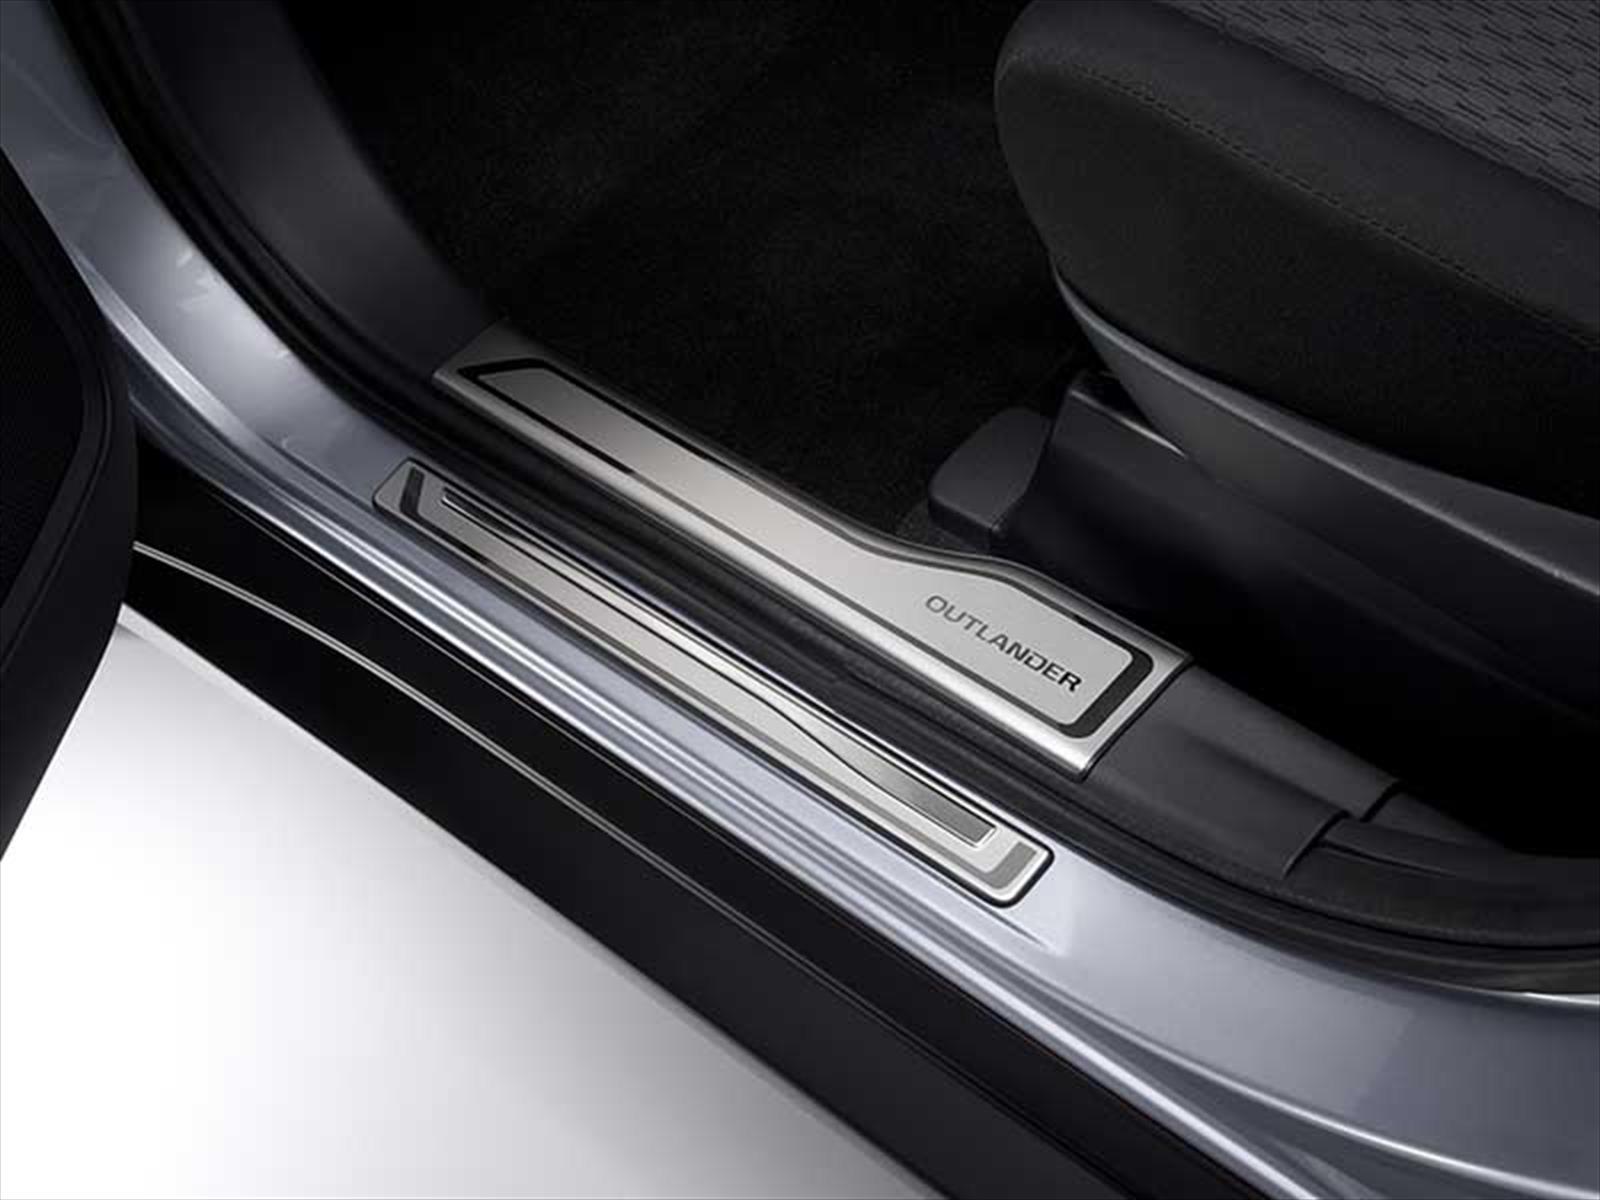 Accesorios Mopar para Mitsubishi Outlander 2016 ...